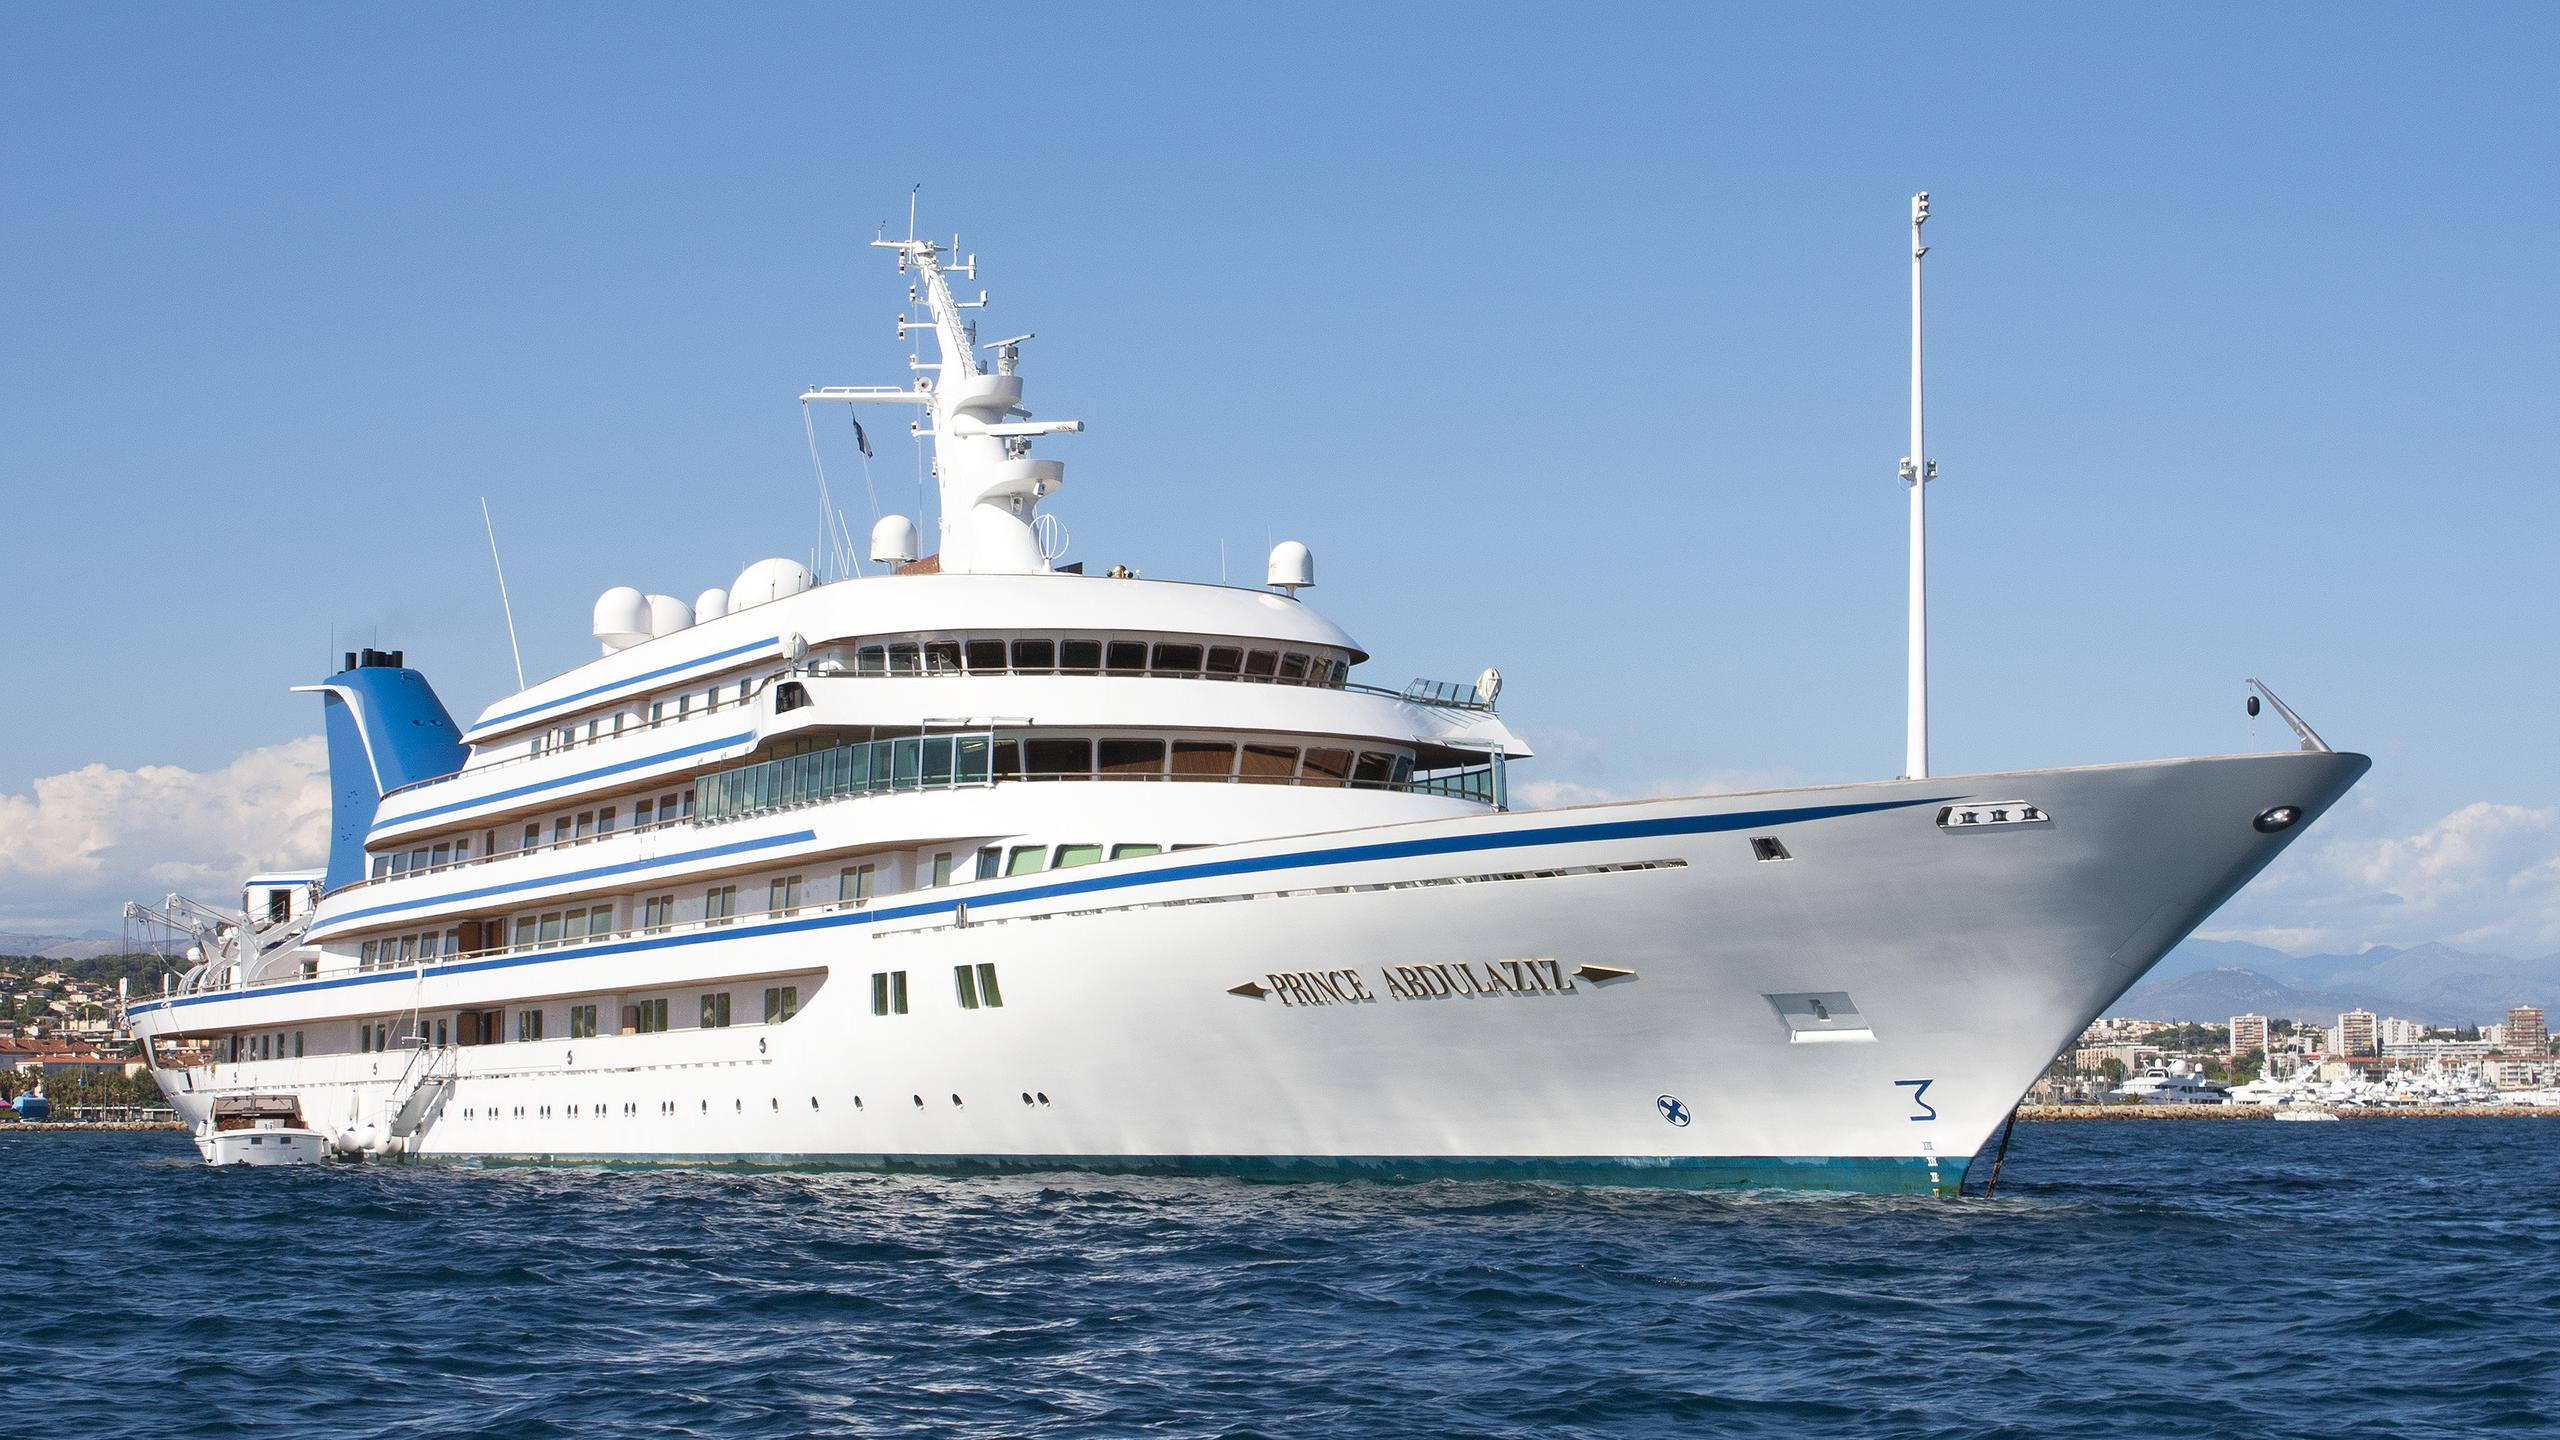 princeabdulaziz-motor-yacht-helsingor-vaerft-1984-147m-bow